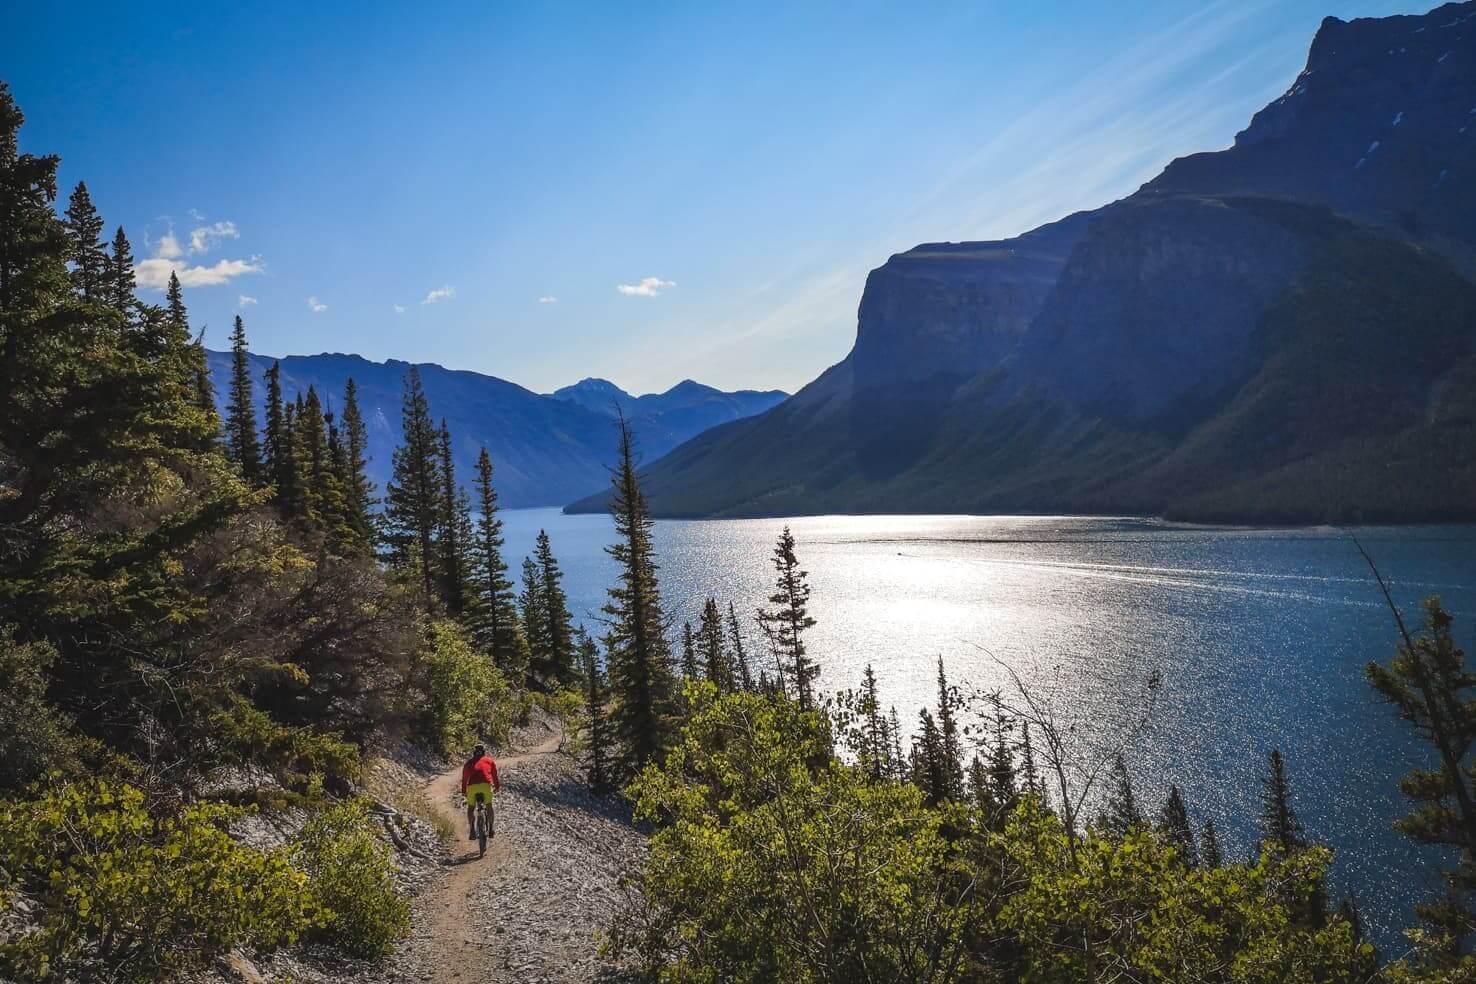 Aylmer Lookout Hike & Bike Trip, Banff National Park